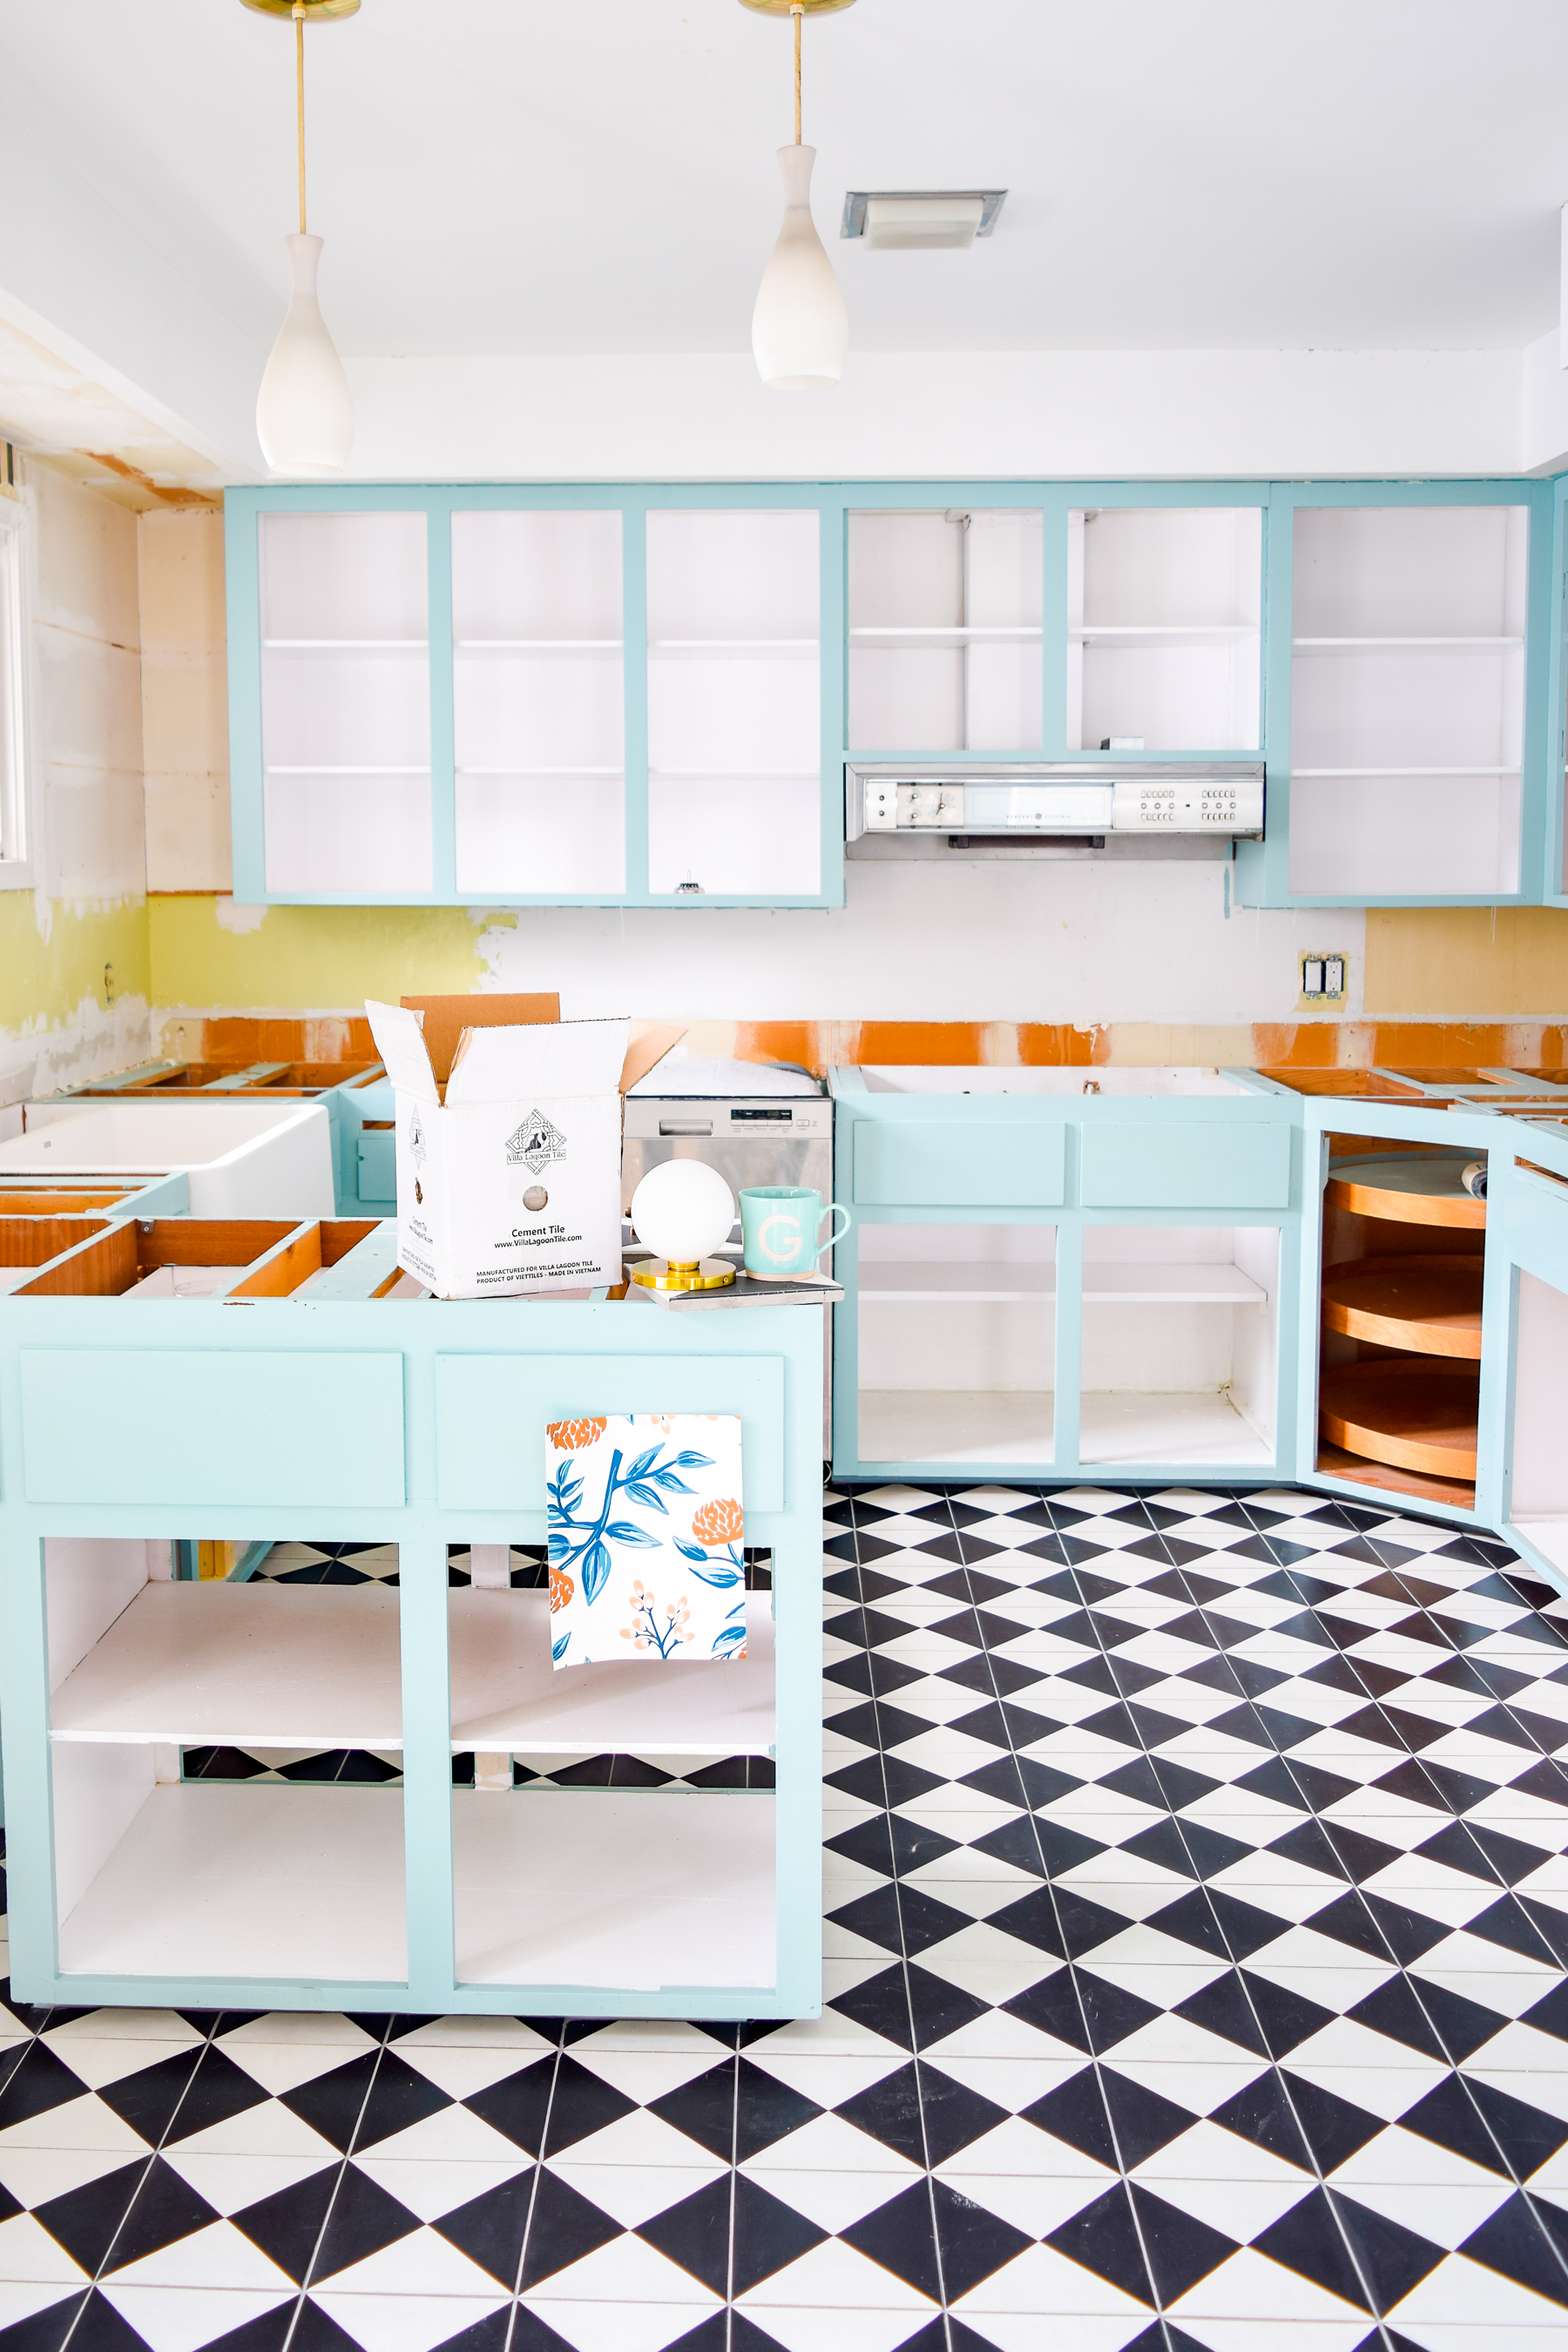 choosing a retro kitchen floor tile